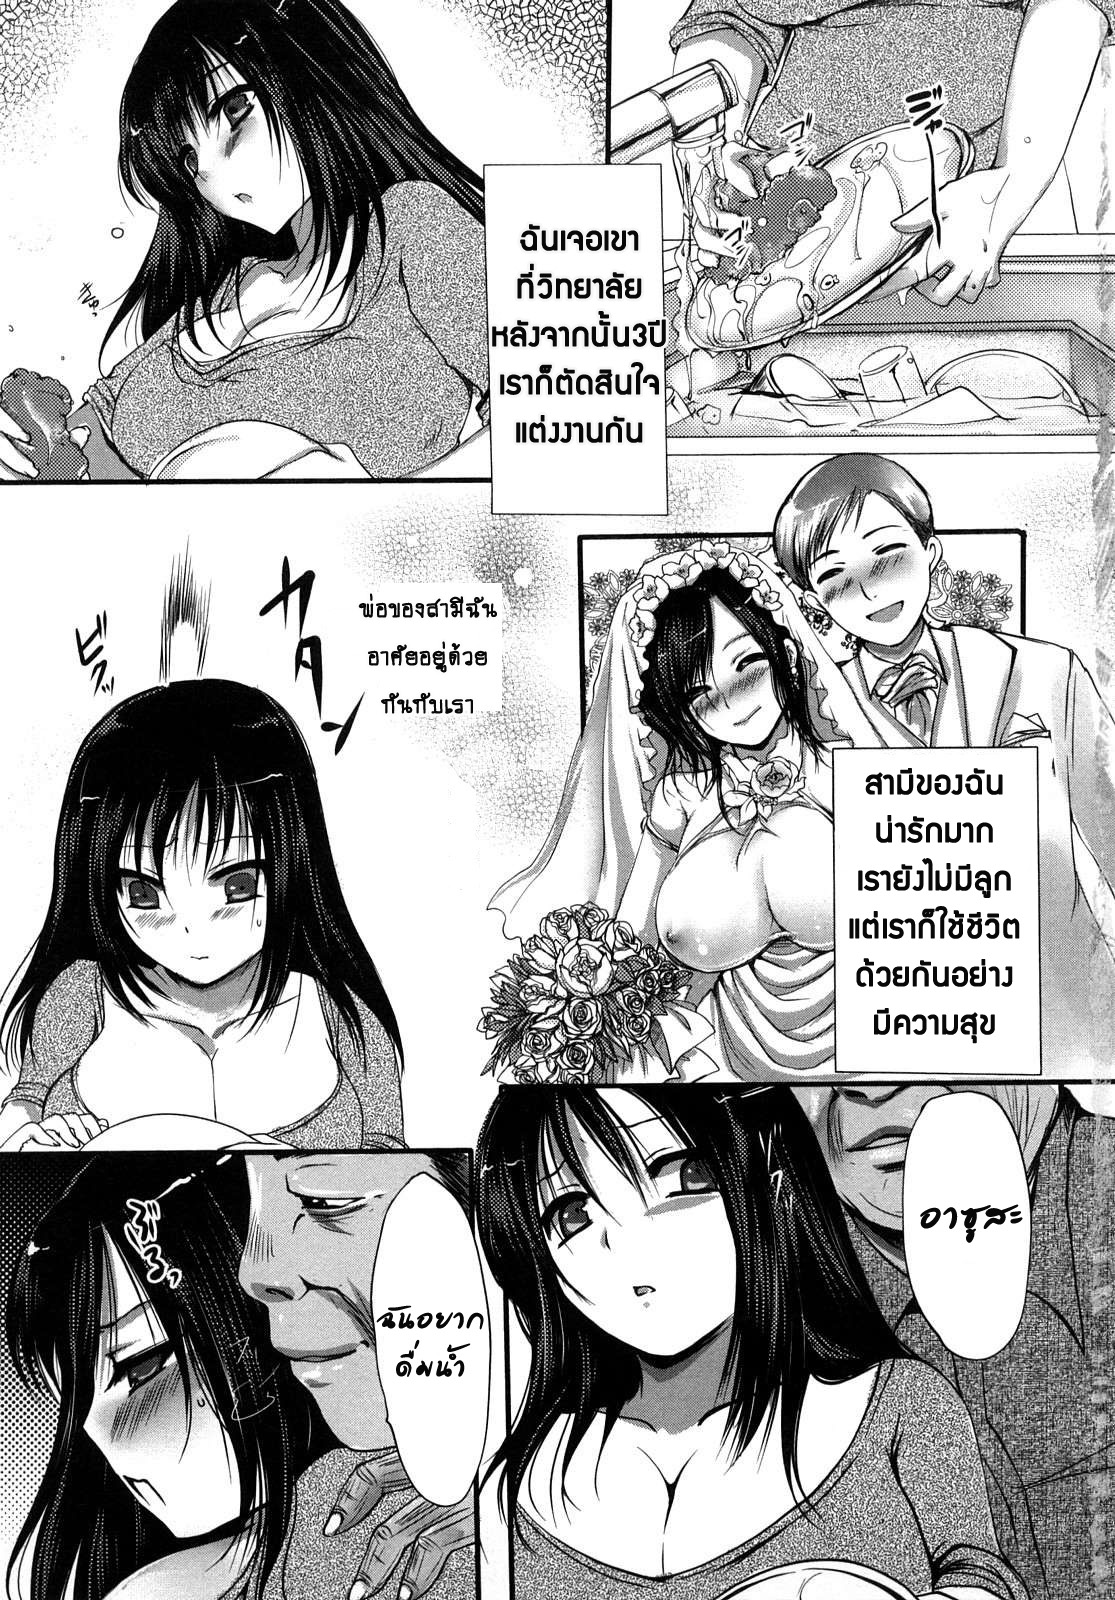 [Aida Mai] Otou-sama no Mesu | ชู้รัก~ คุณพ่อสามี (Kandume) [Thai ภาษาไทย] {Nashiko}